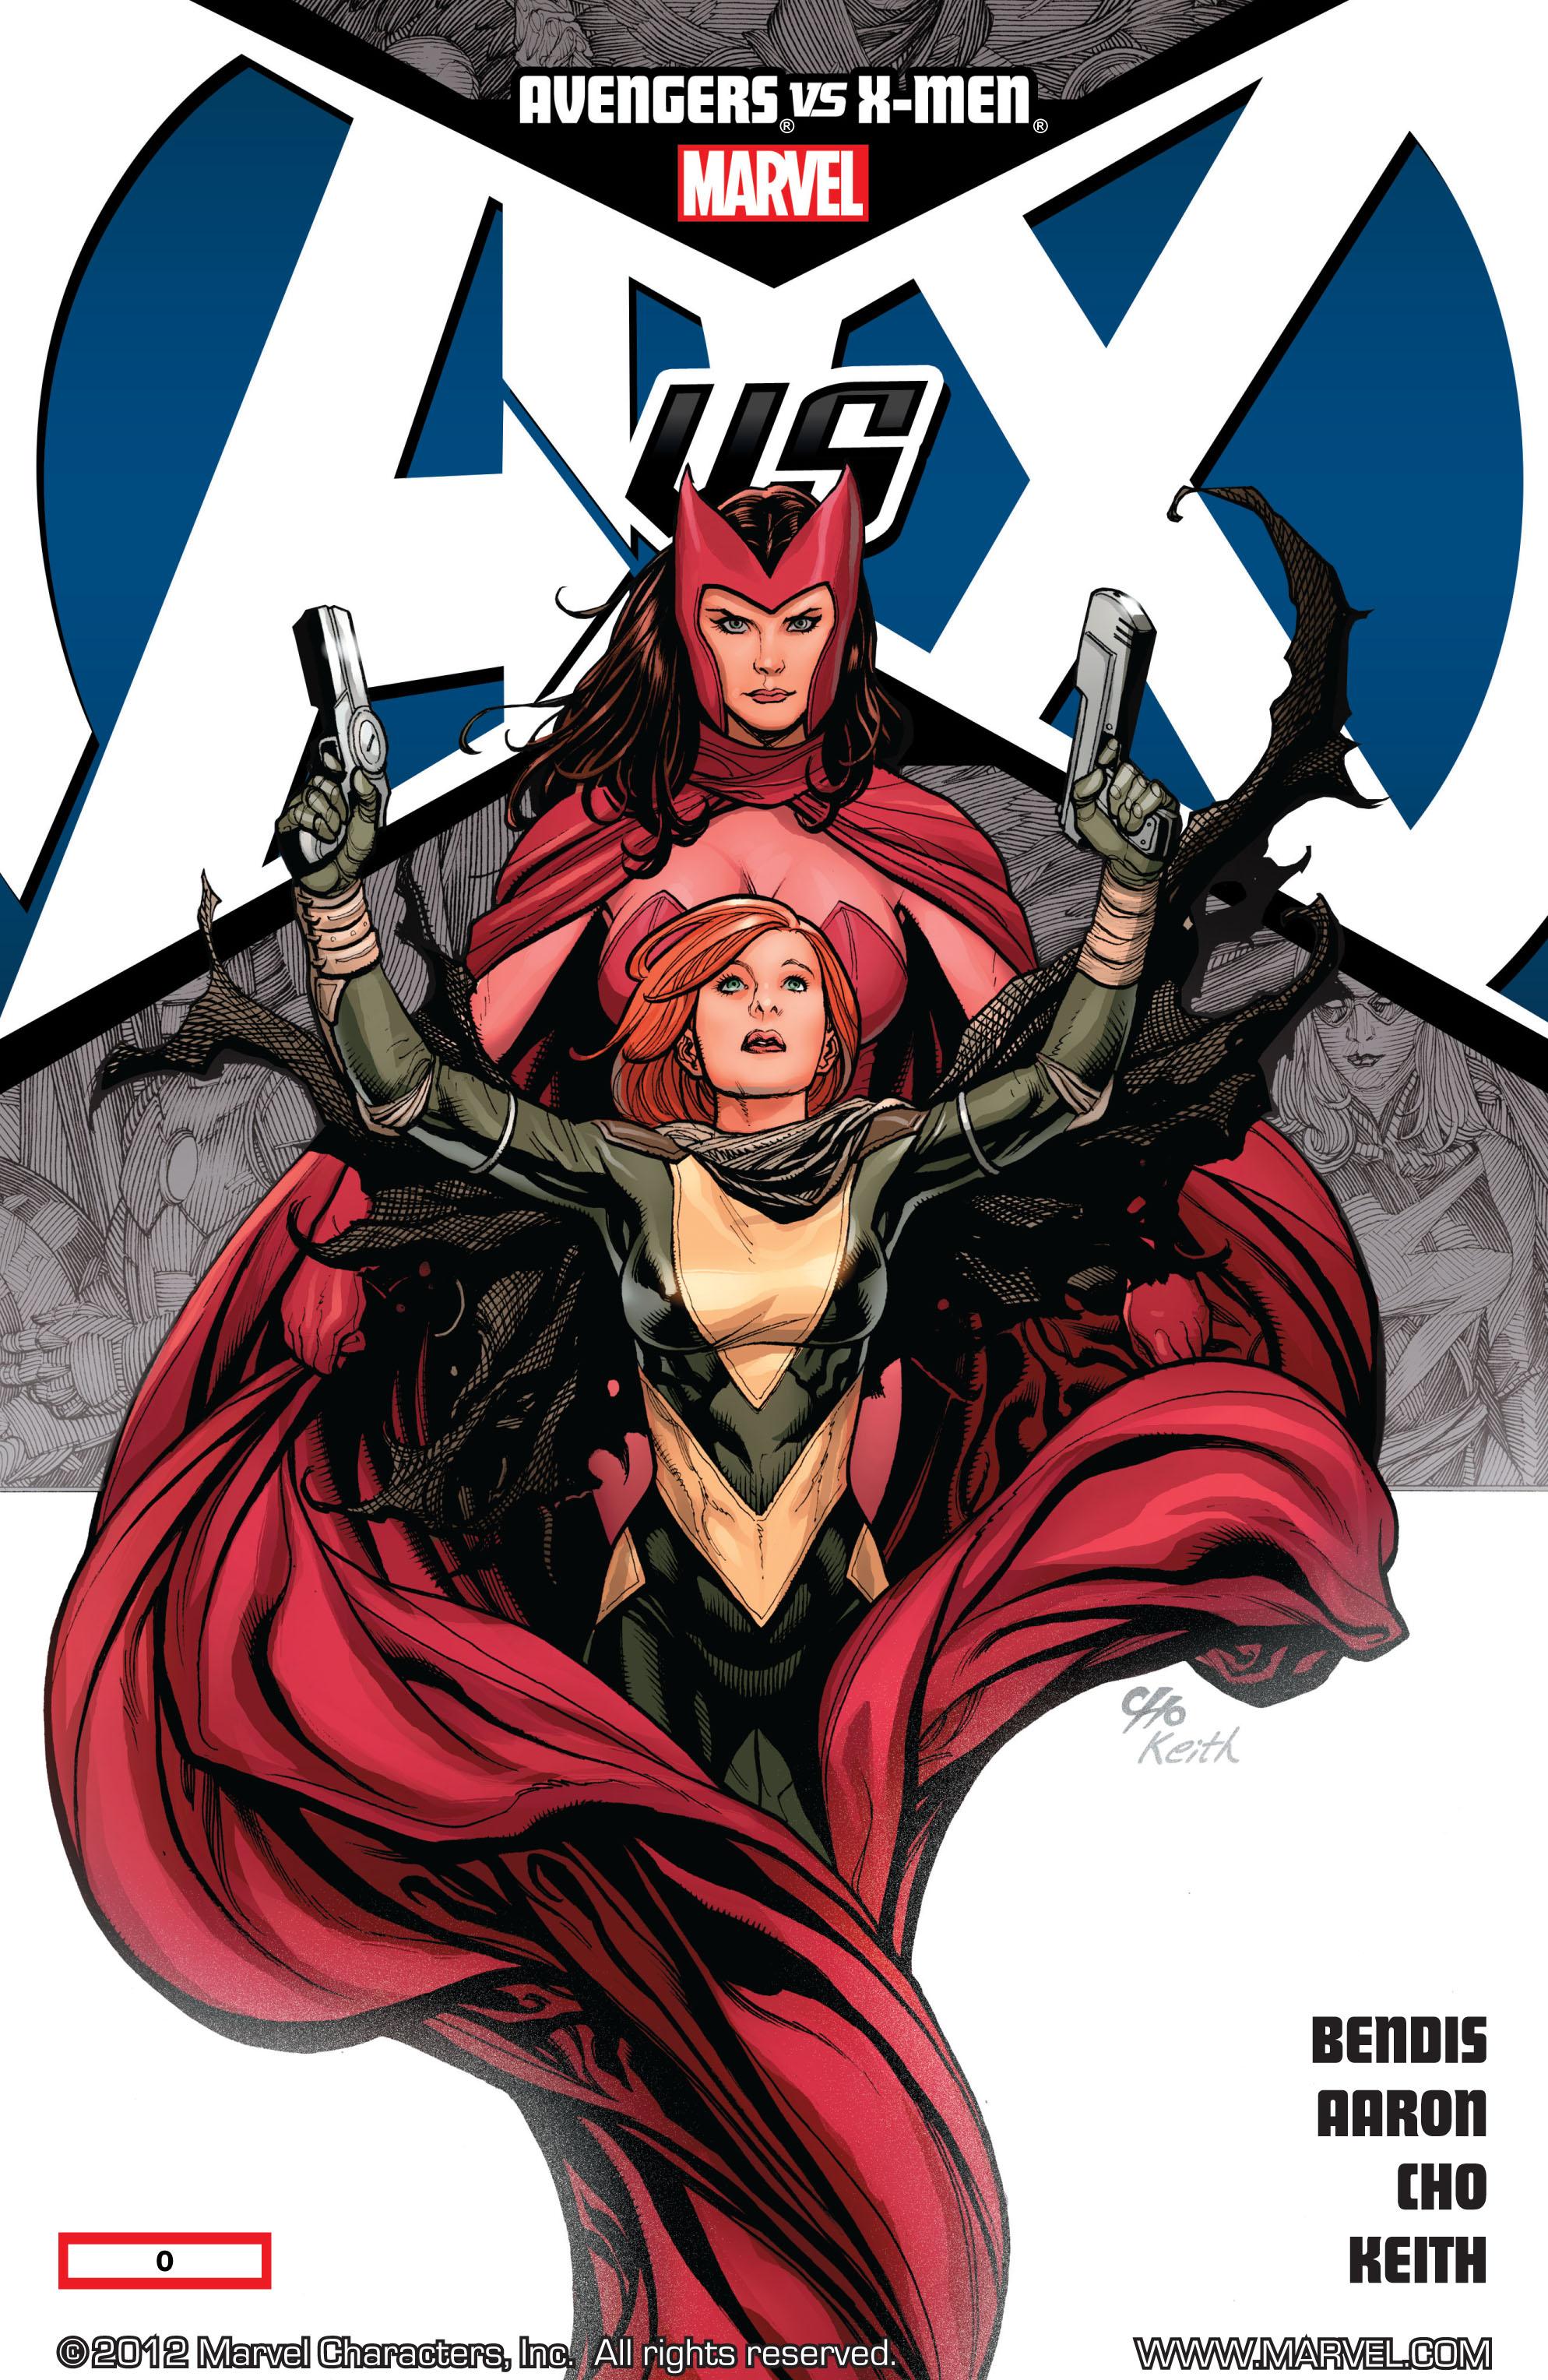 Avengers Vs X Men Viewcomic Reading Comics Online For Free 2019